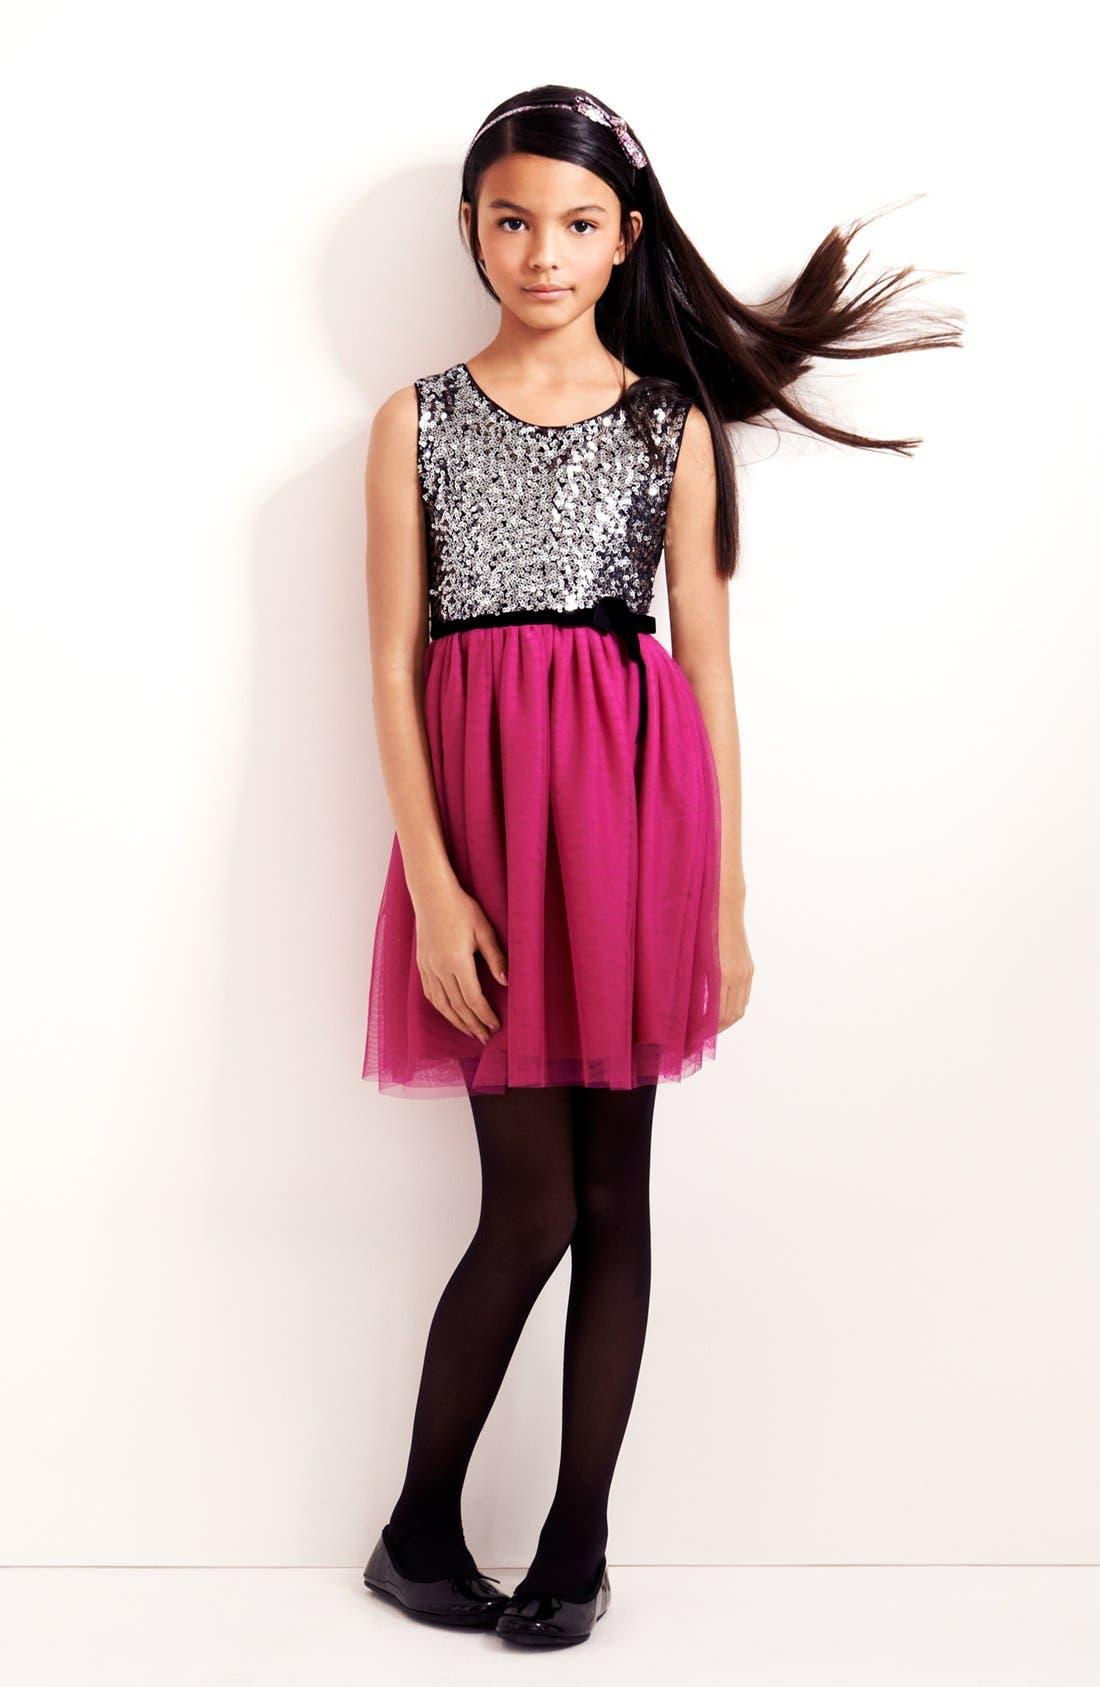 Alternate Image 1 Selected - Zunie Sequin Dress & Nordstrom Ballet Flat (Big Girls)